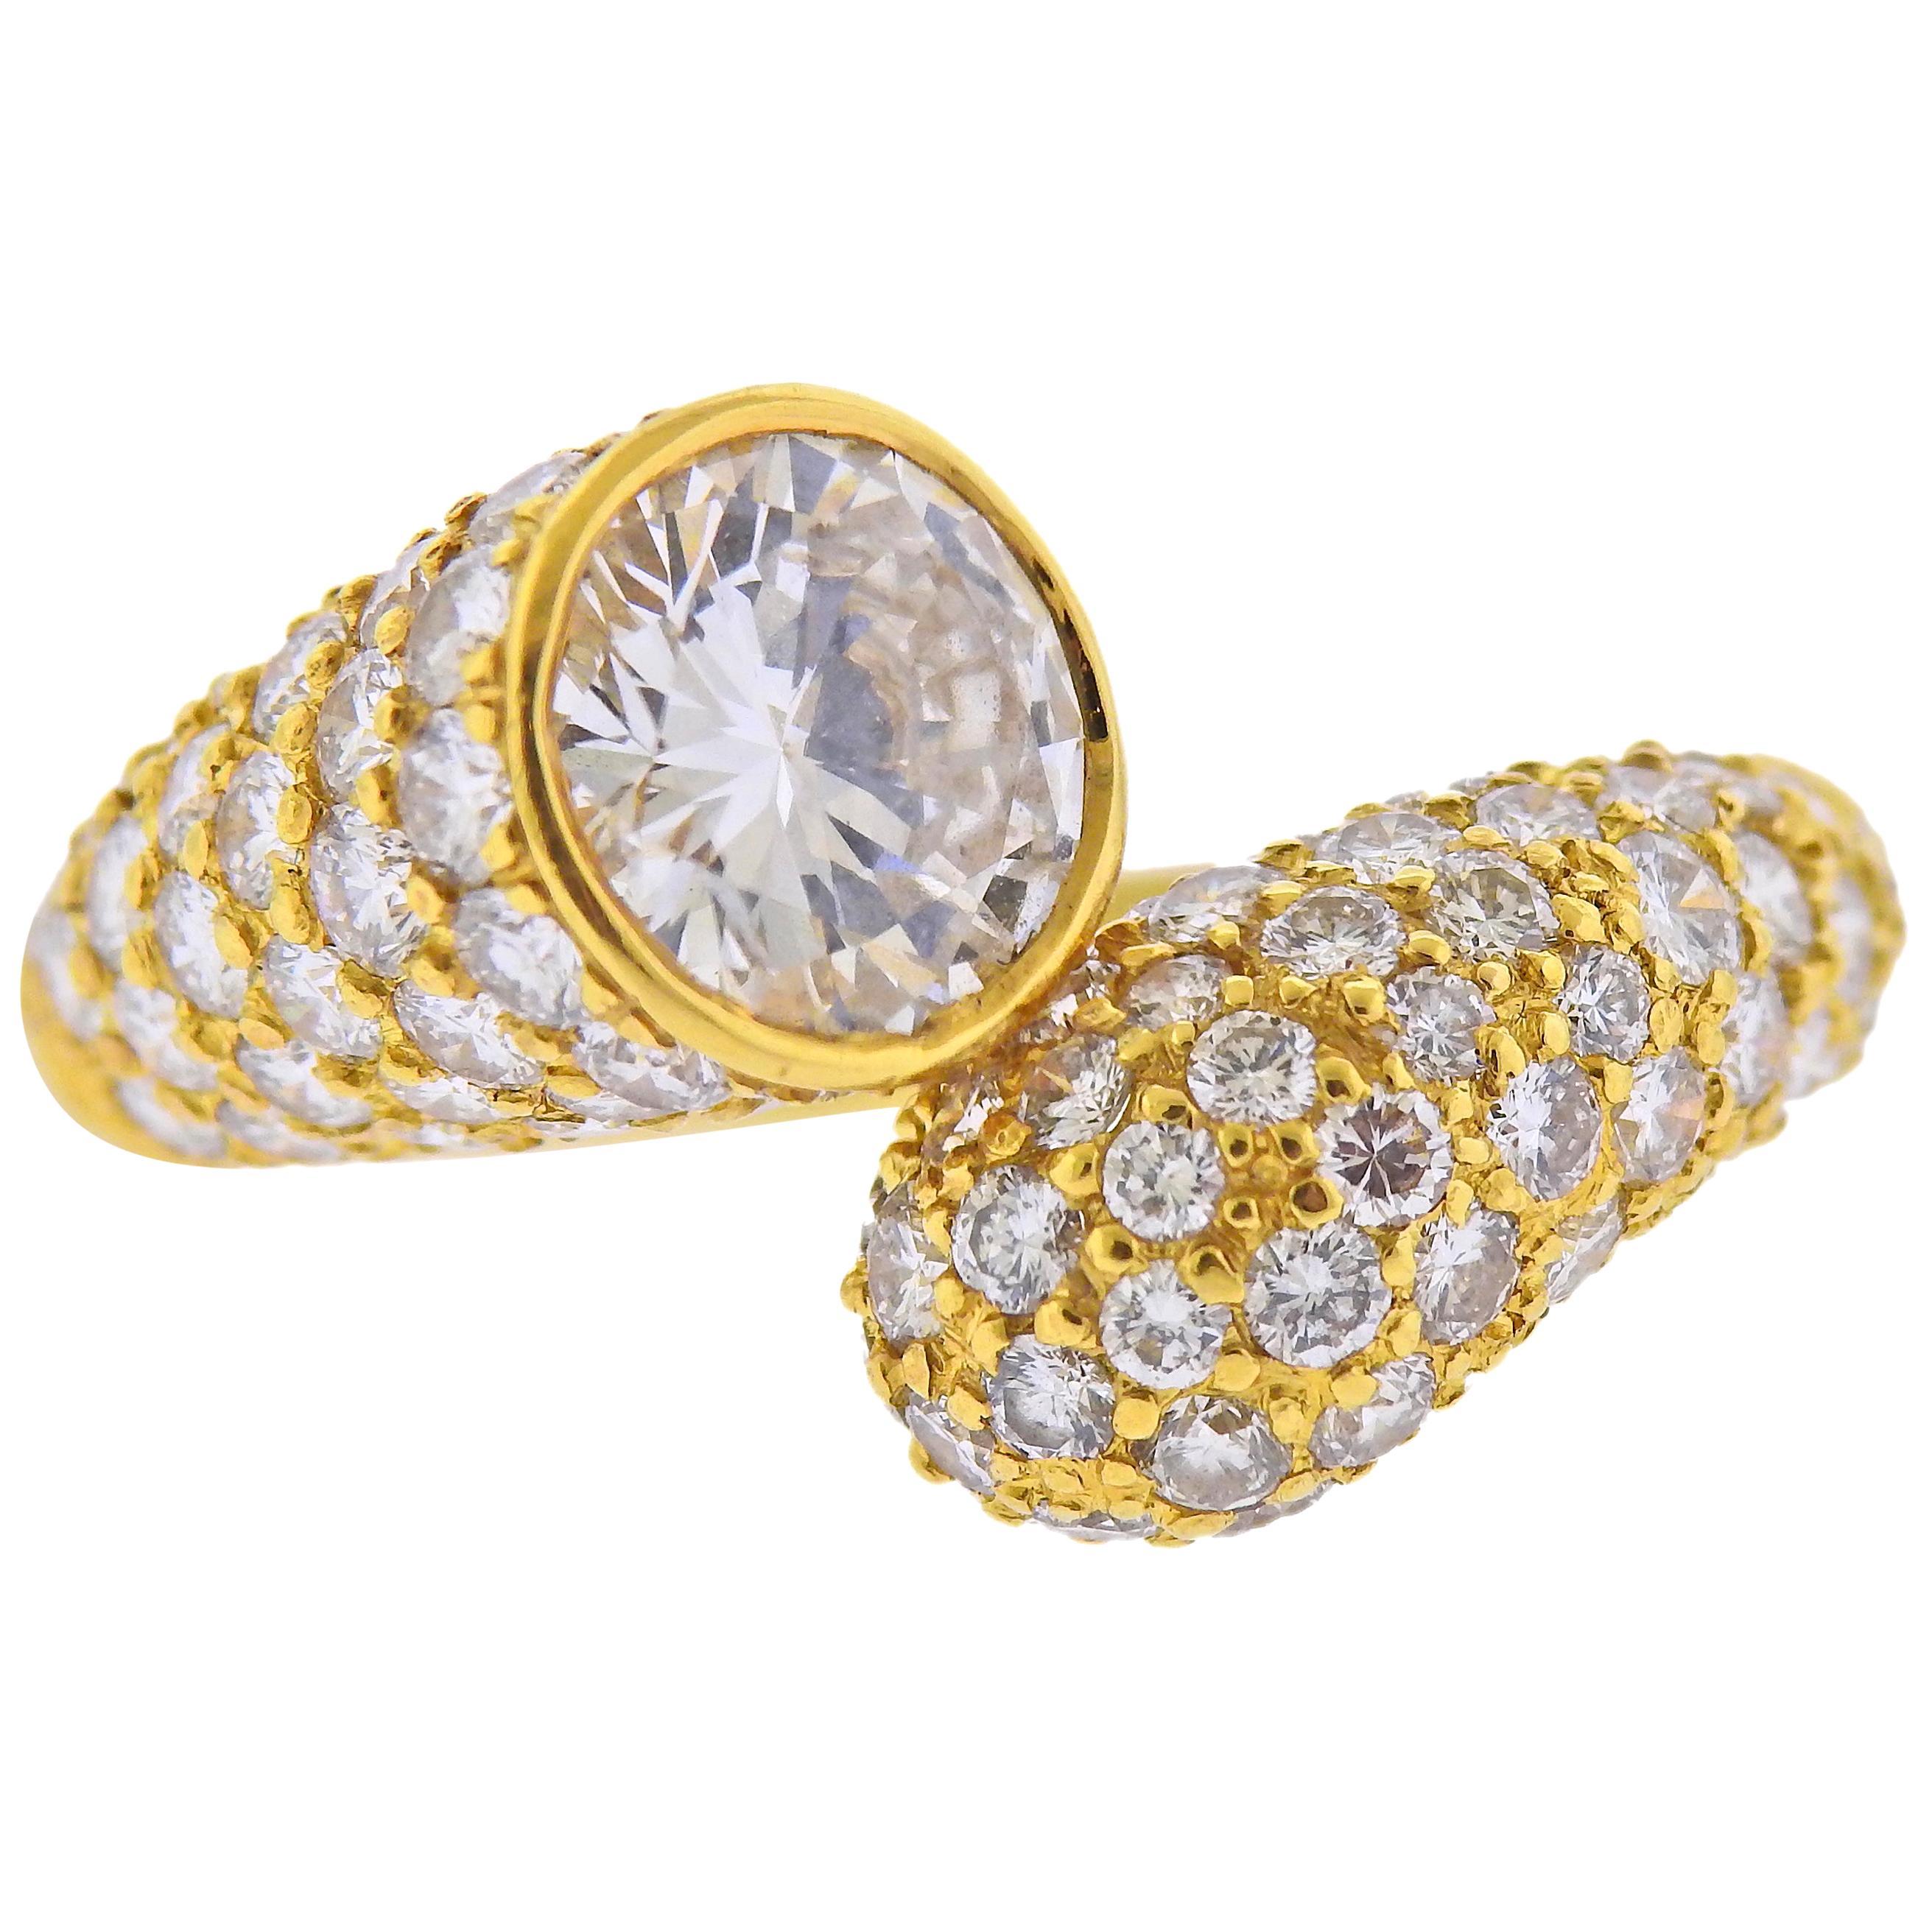 Harry Winston GIA 2.24 Carat D VVS2 Diamond Gold Ring